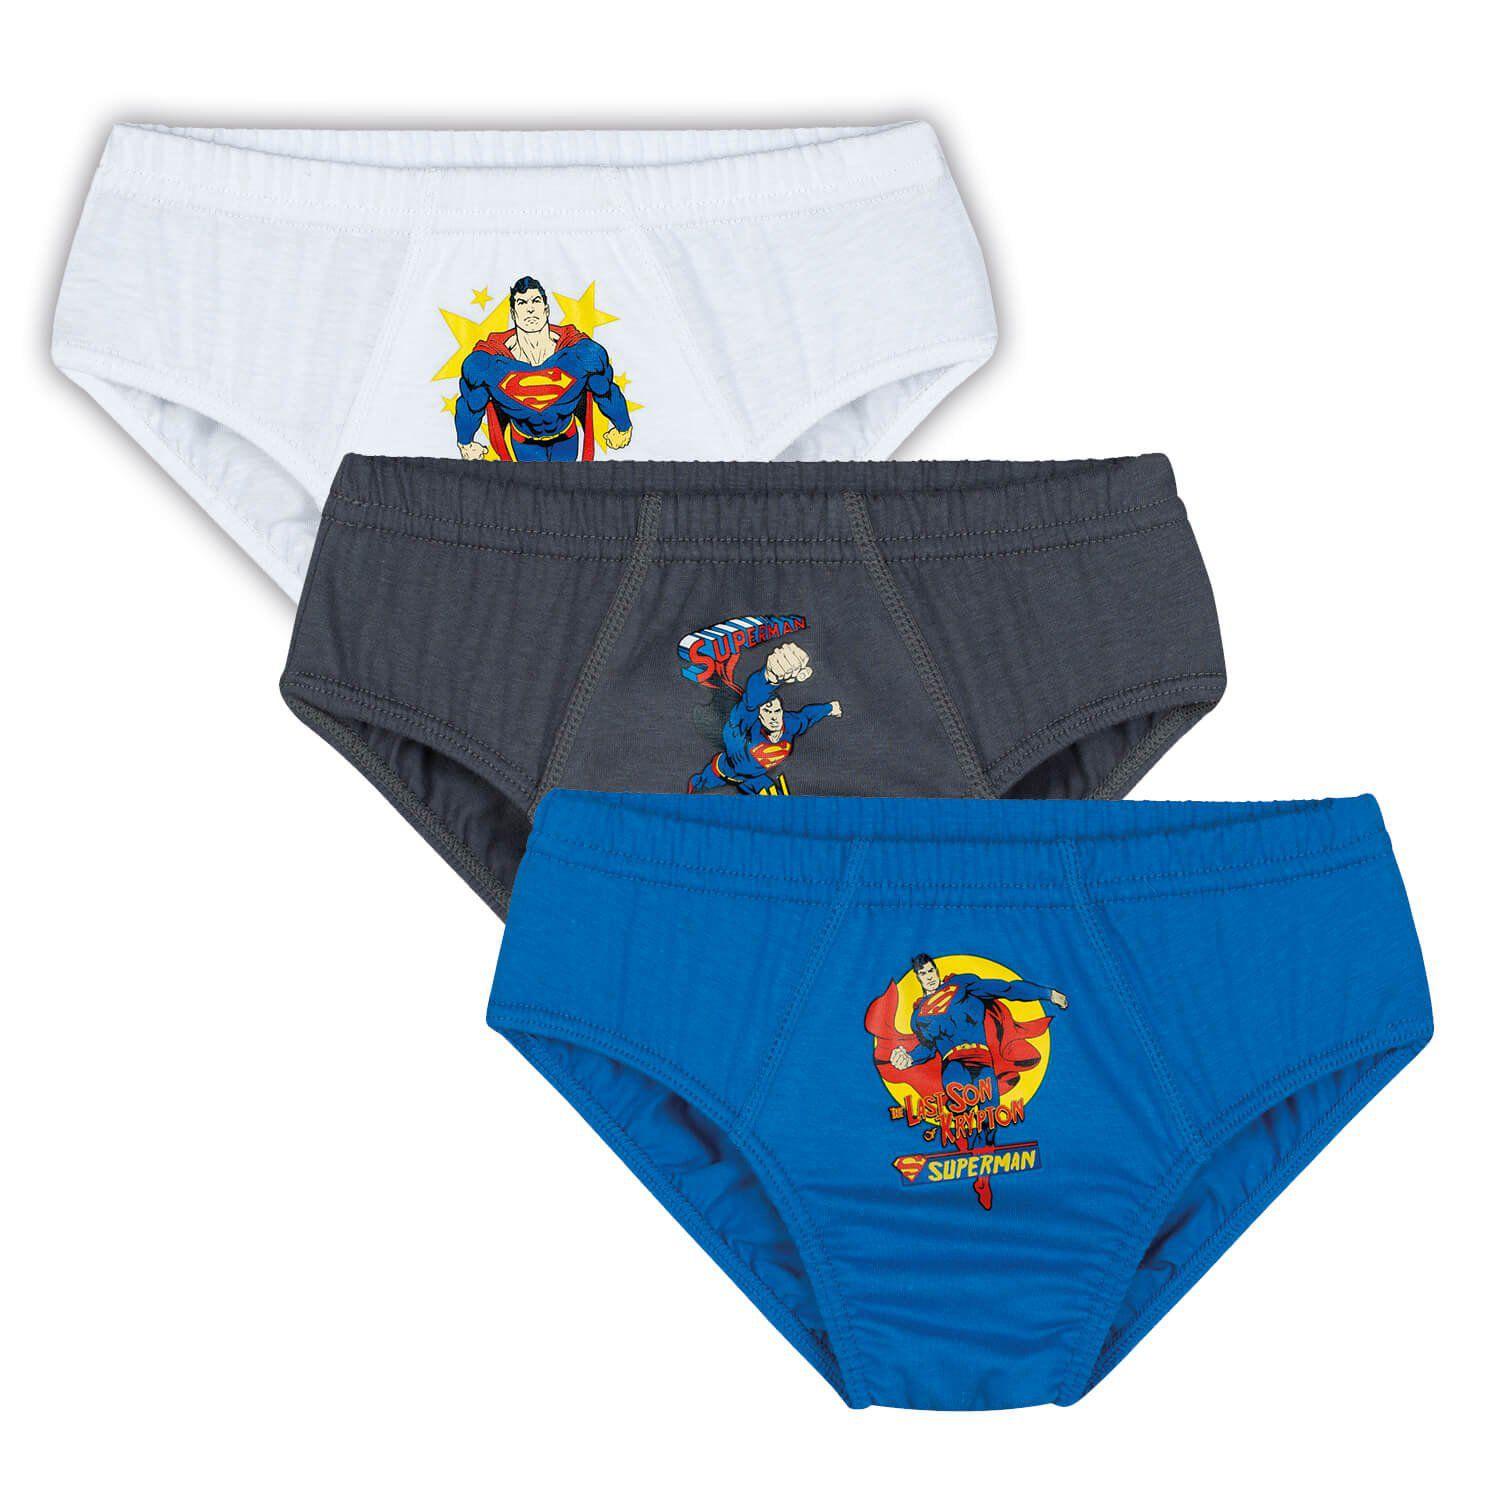 Cueca Infantil Kit 3 cuecas Superman Lupo